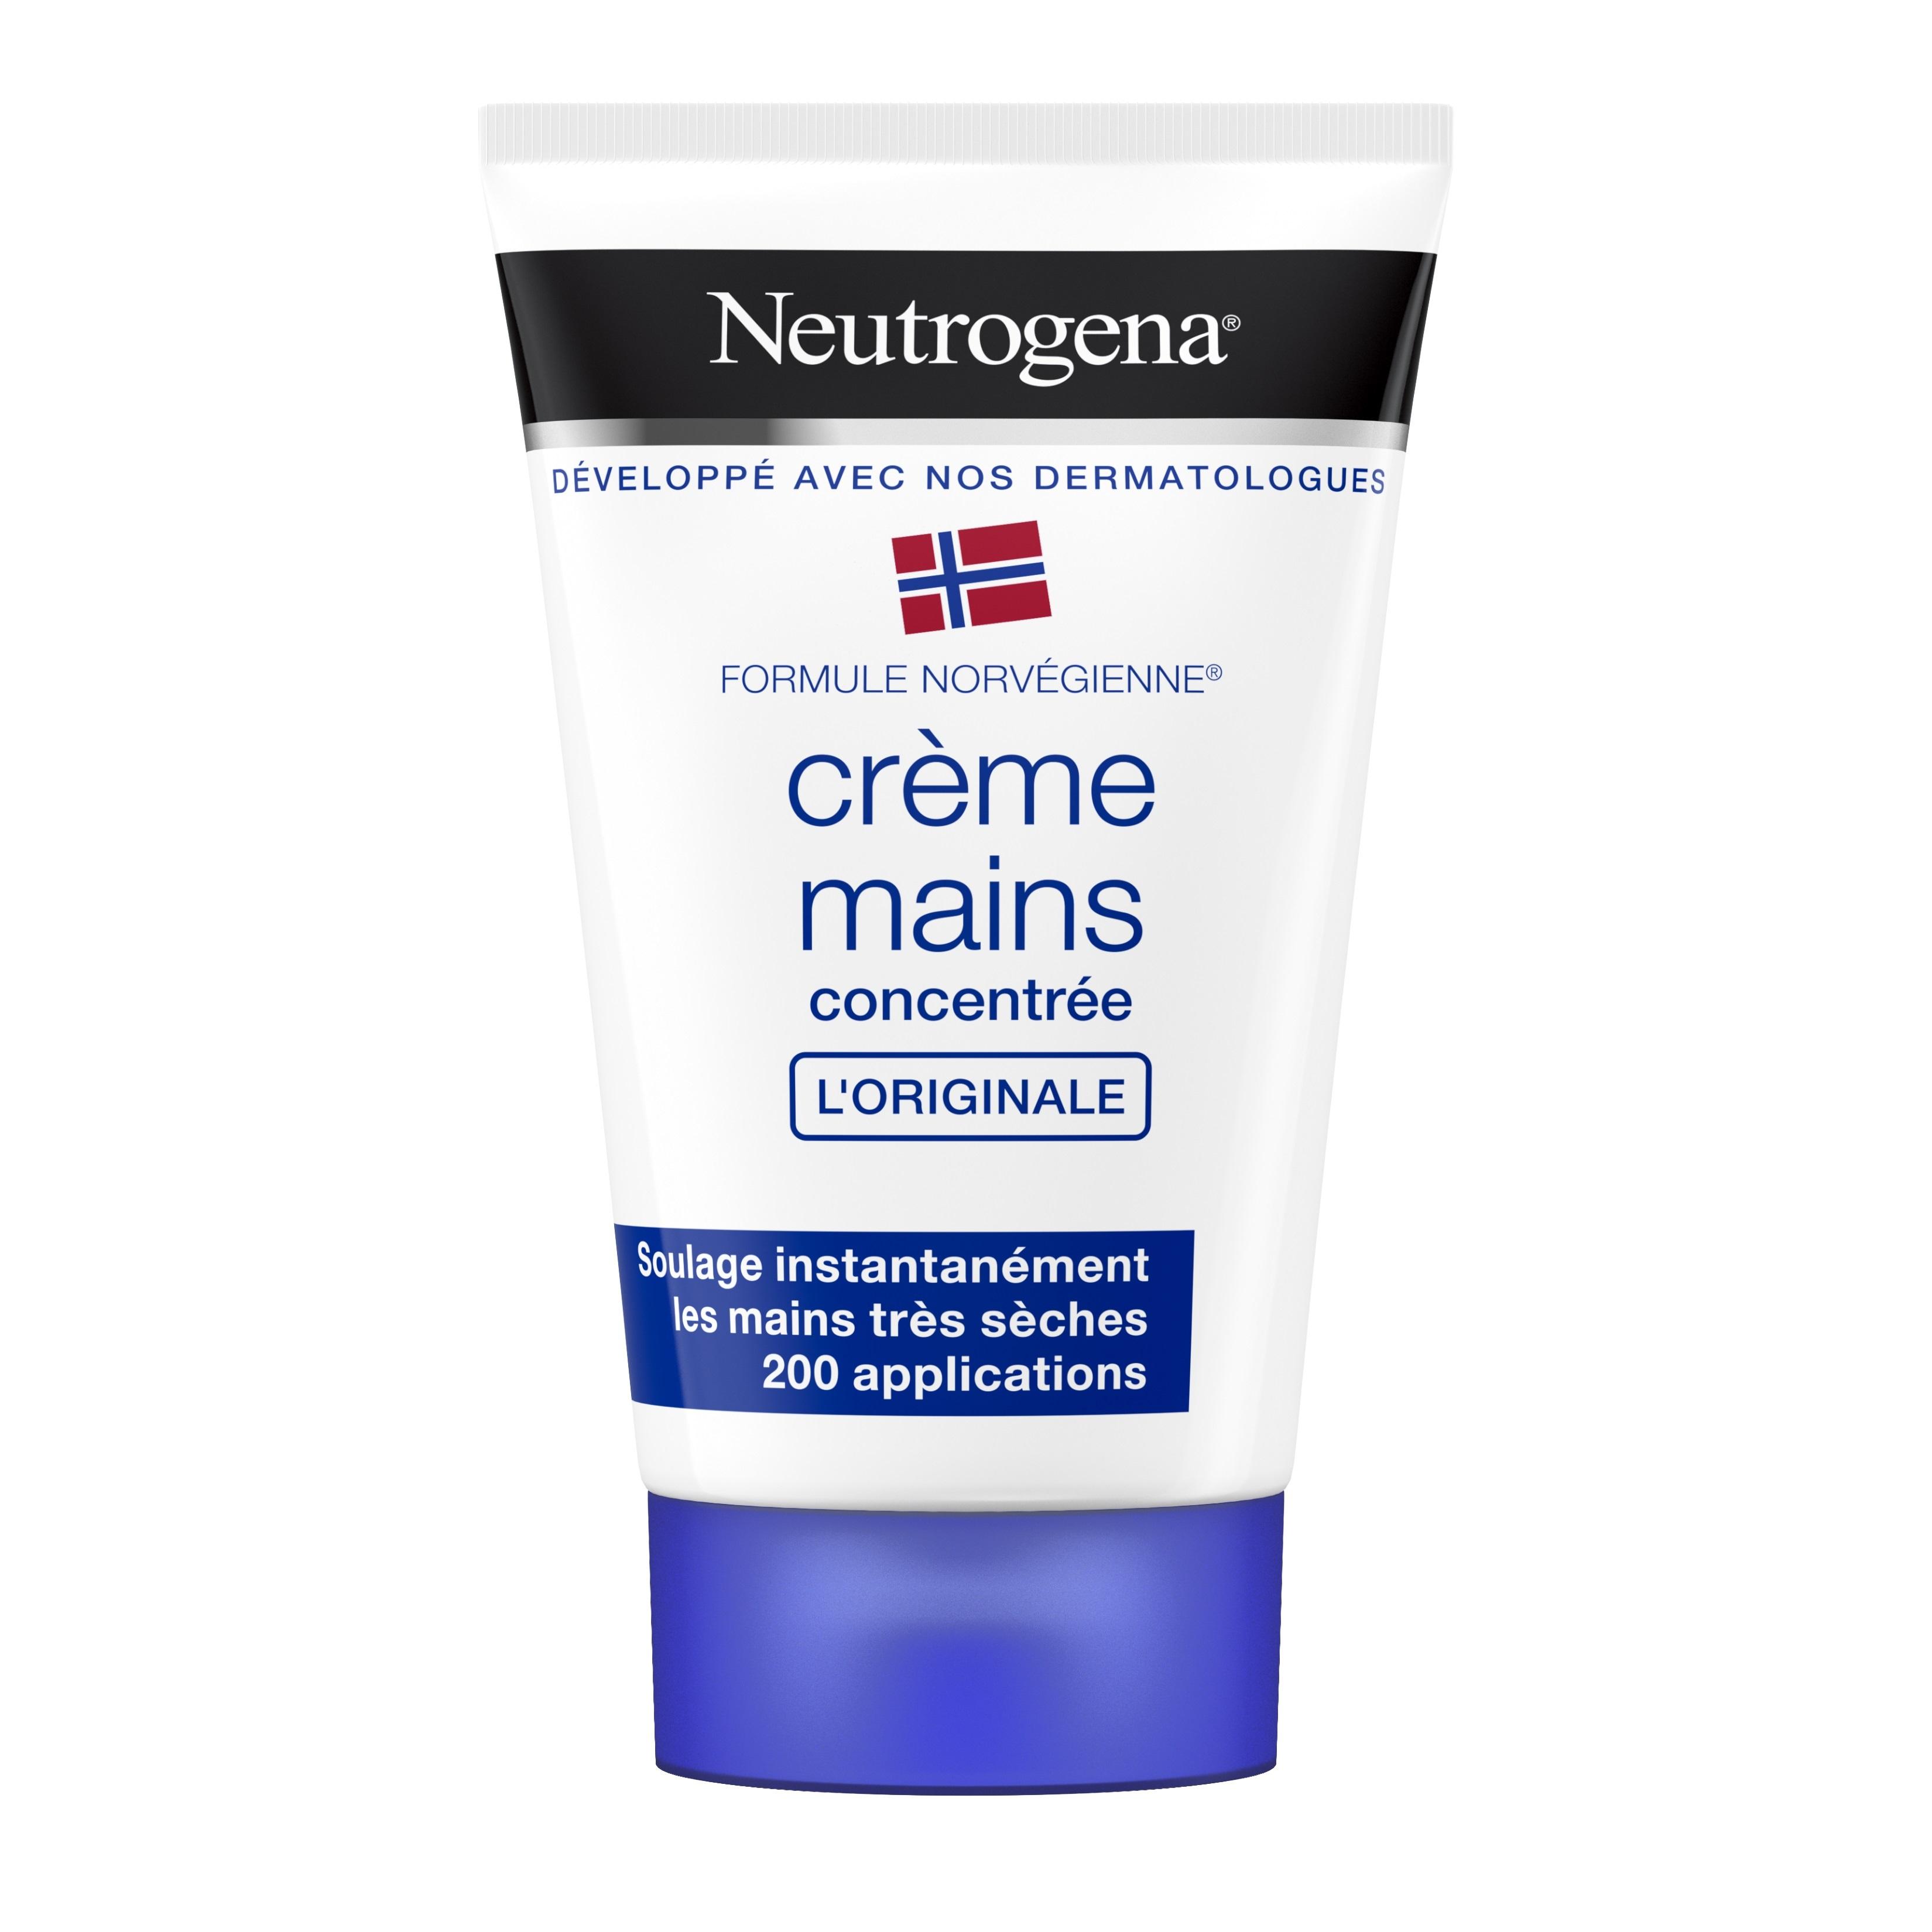 Image of Neutrogena crème mains parfumée